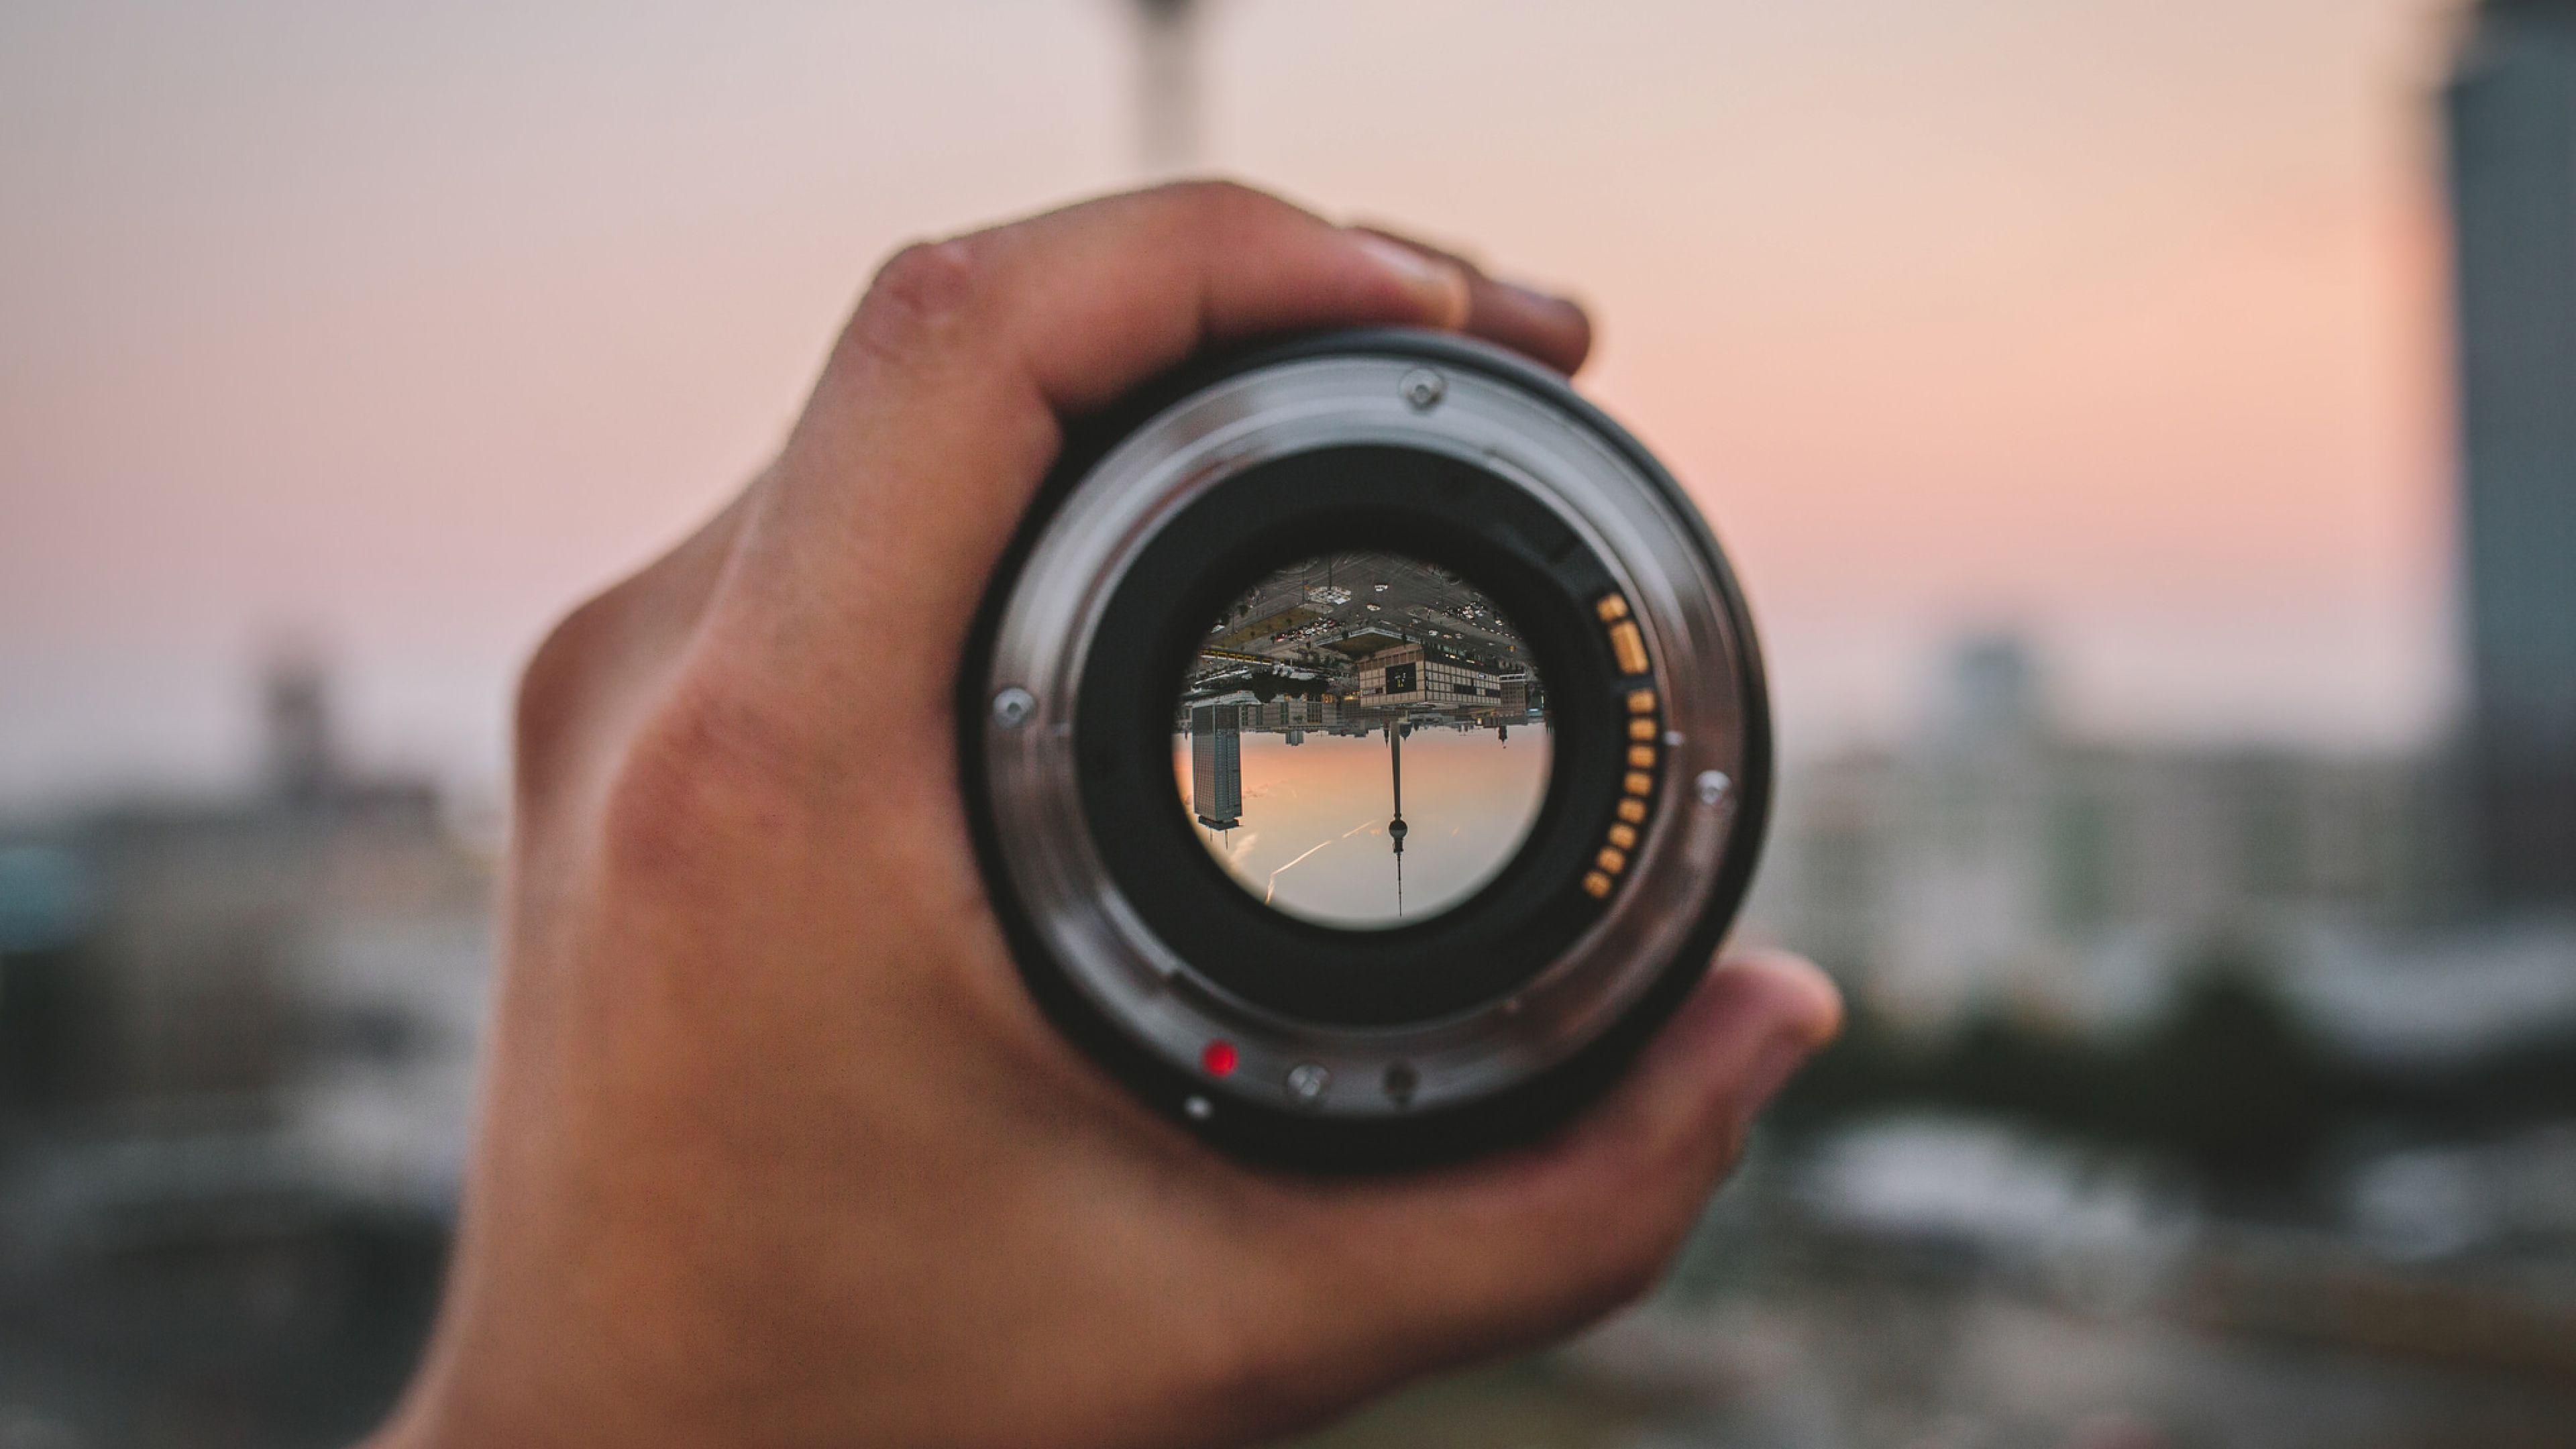 Camera Lens Wallpaper Hd Resolution Best Camera Lenses Best Camera Camera Lens Hd wallpaper photo hand lens focus